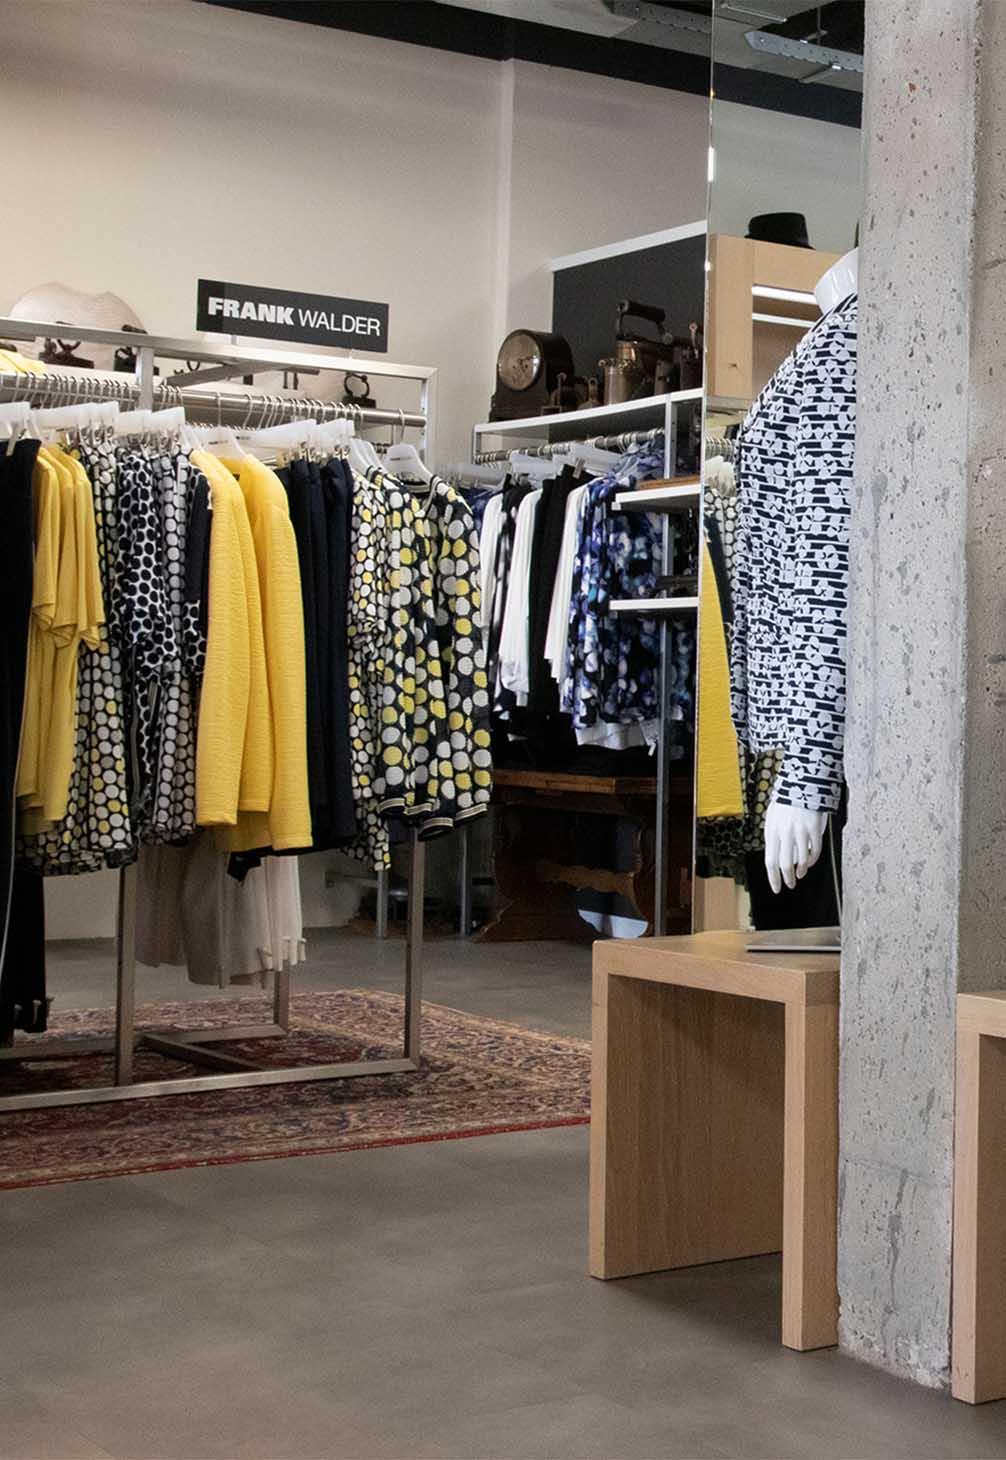 hoesmode veldhoven, kledingwinkel, hoogwaardige collectie dameskleding, Monique Hoes